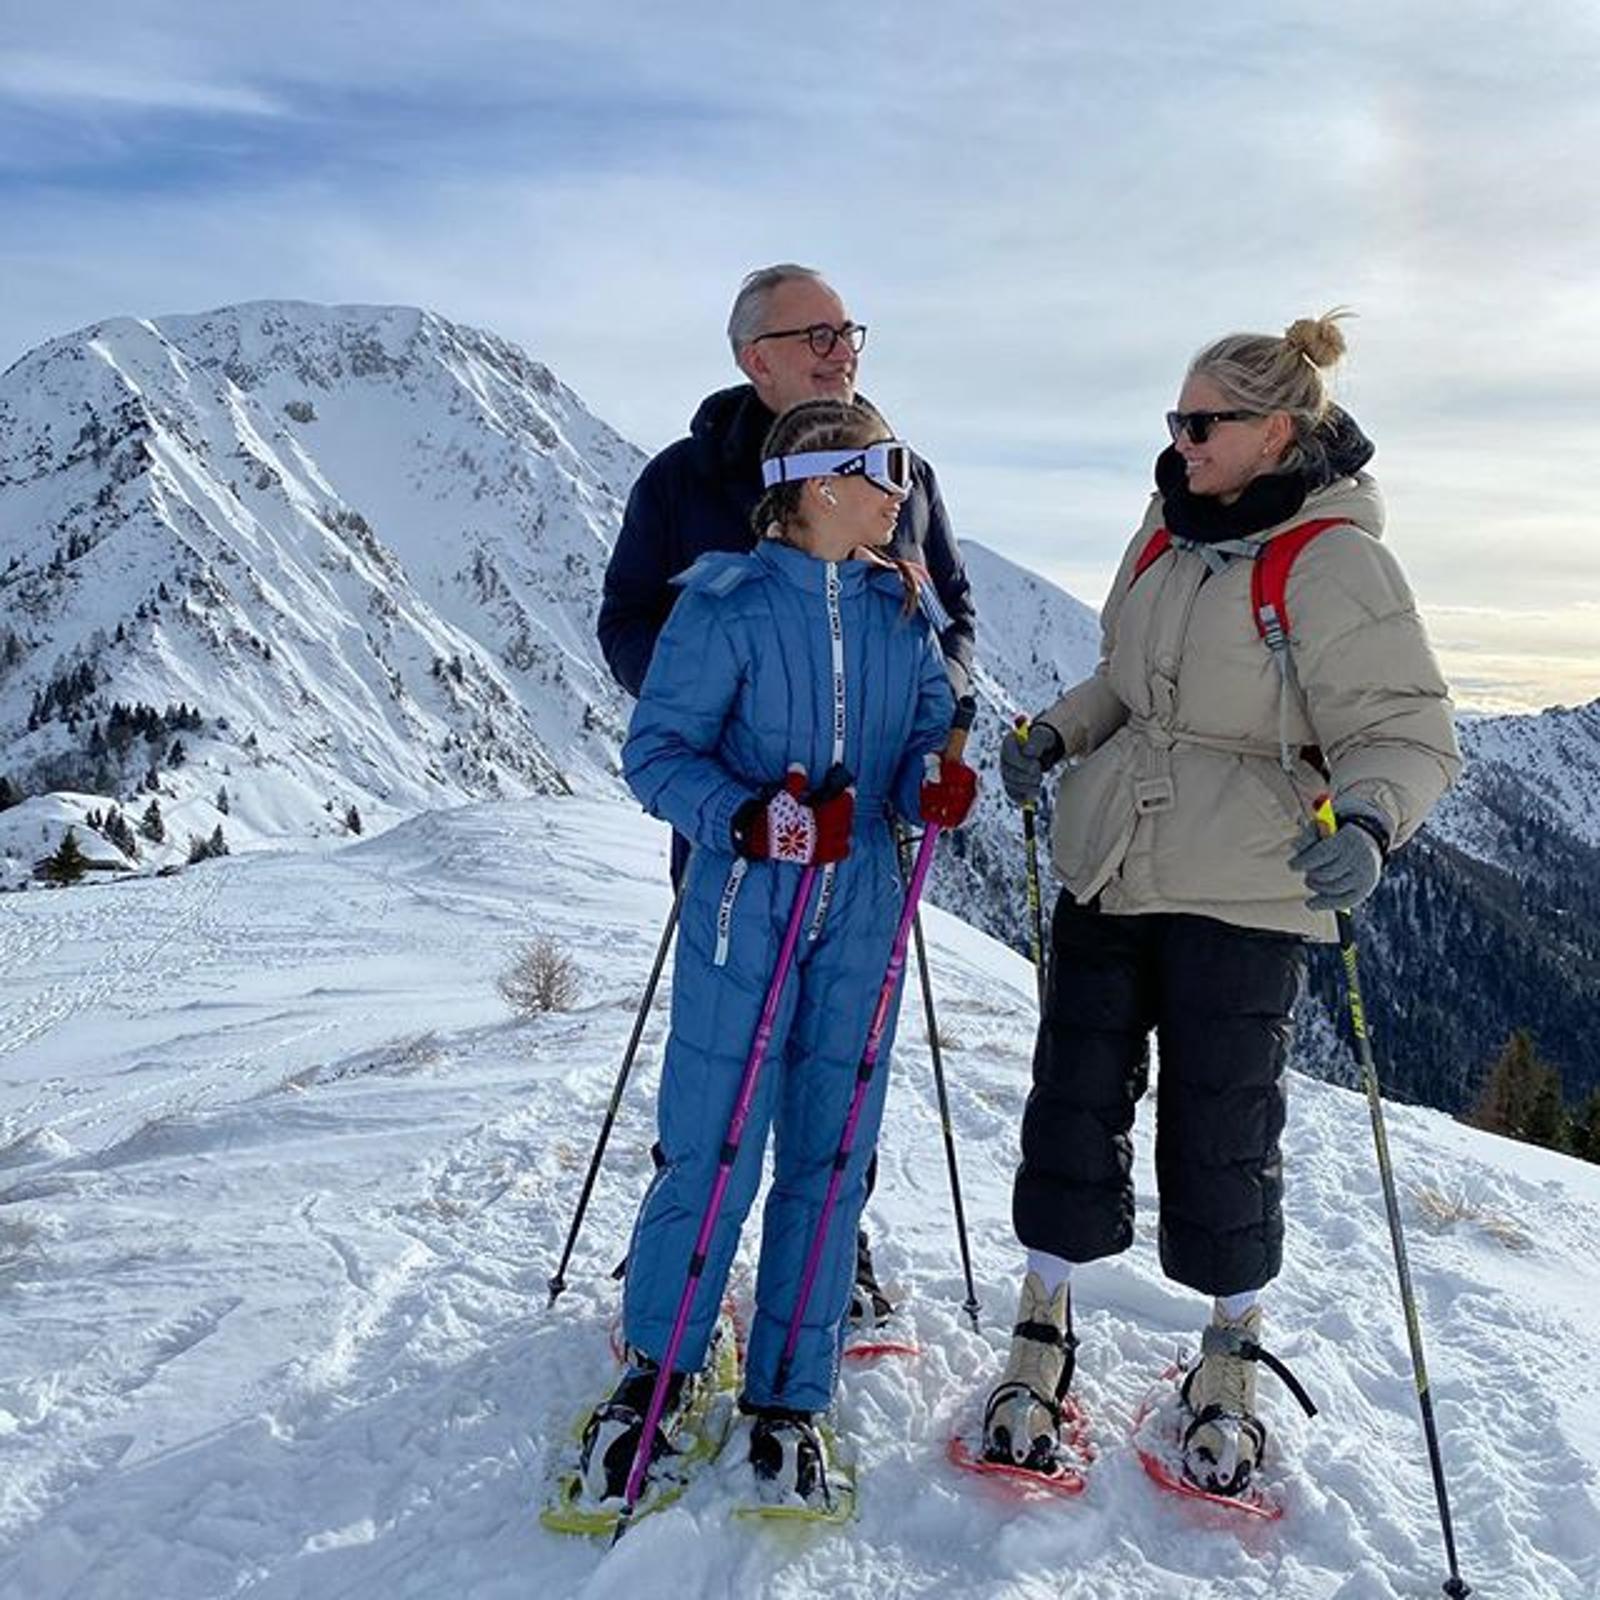 Сарочка, Верочка и Константин! Брежнева отдыхает в горах с семьей